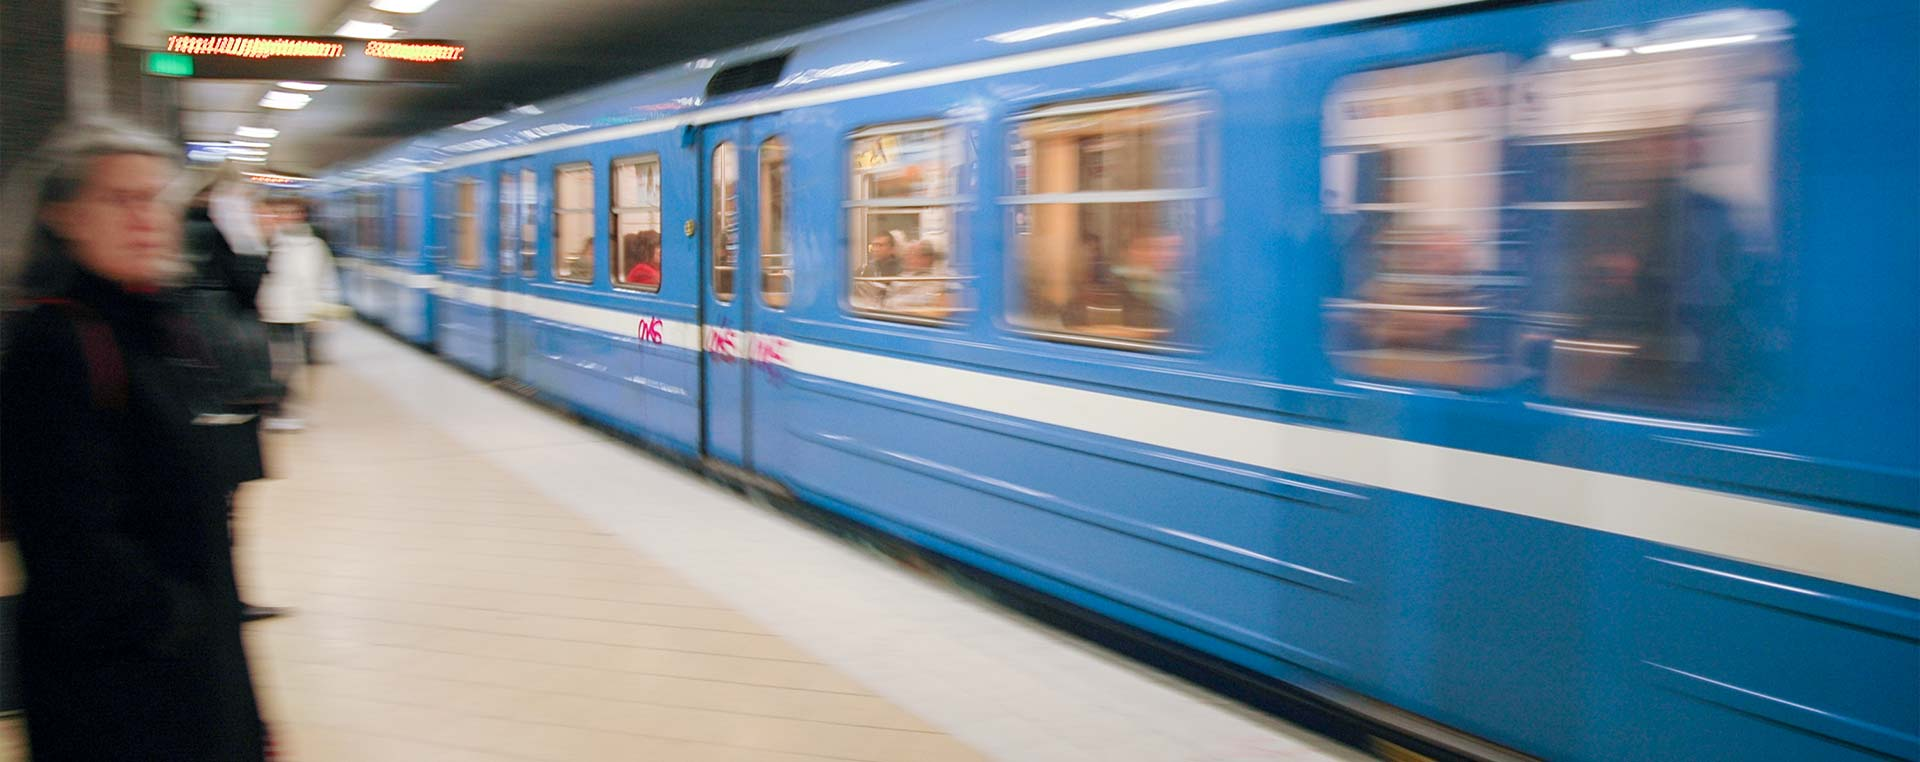 topimg-subway2.jpg